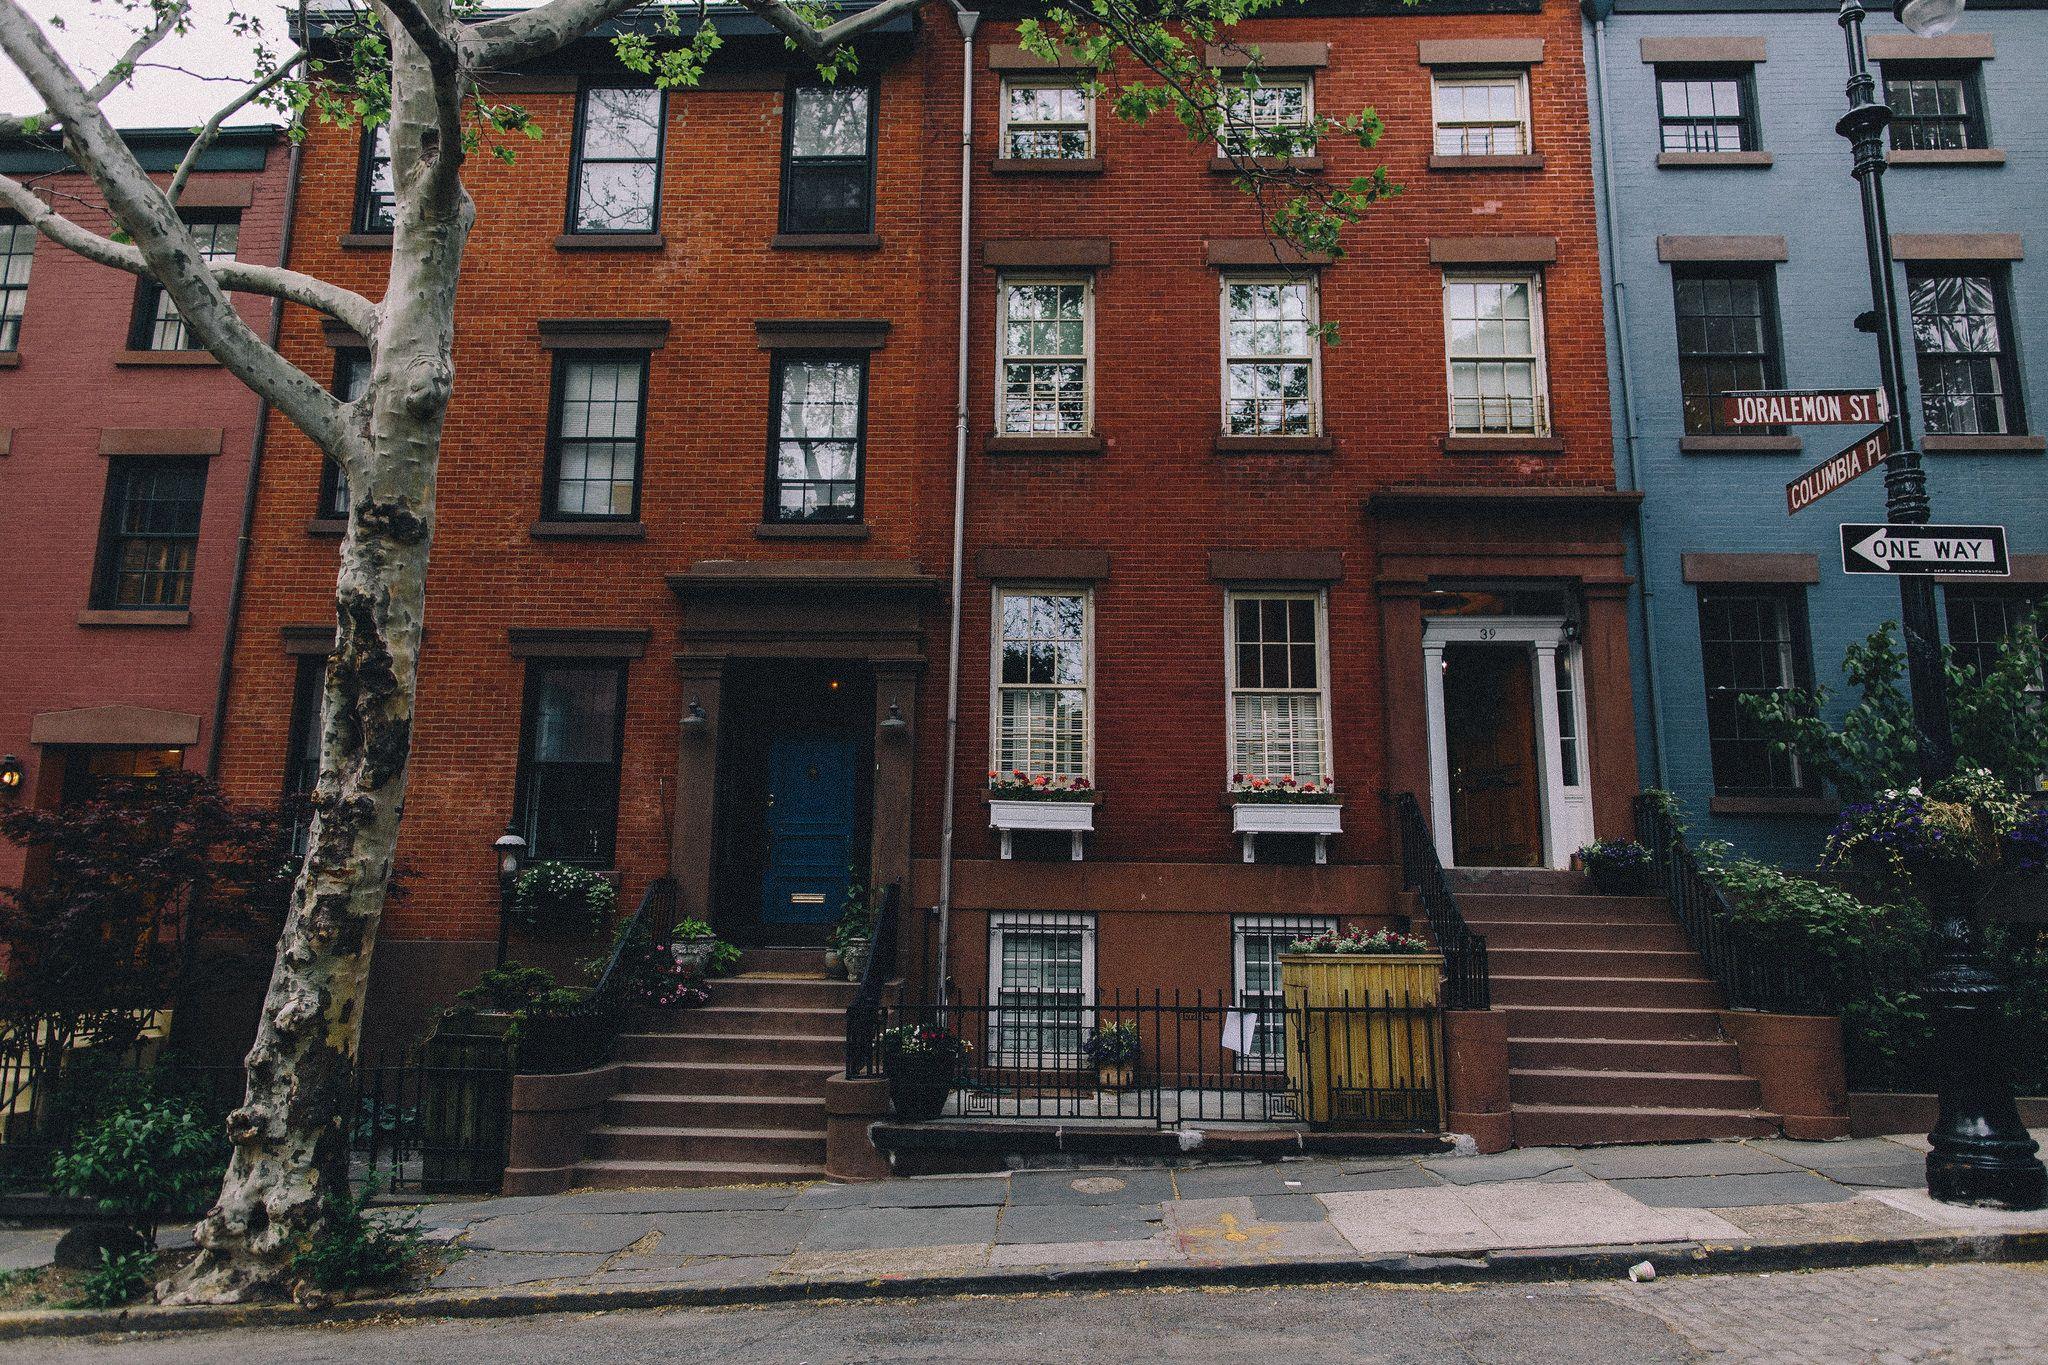 Joralemon St | Brooklyn